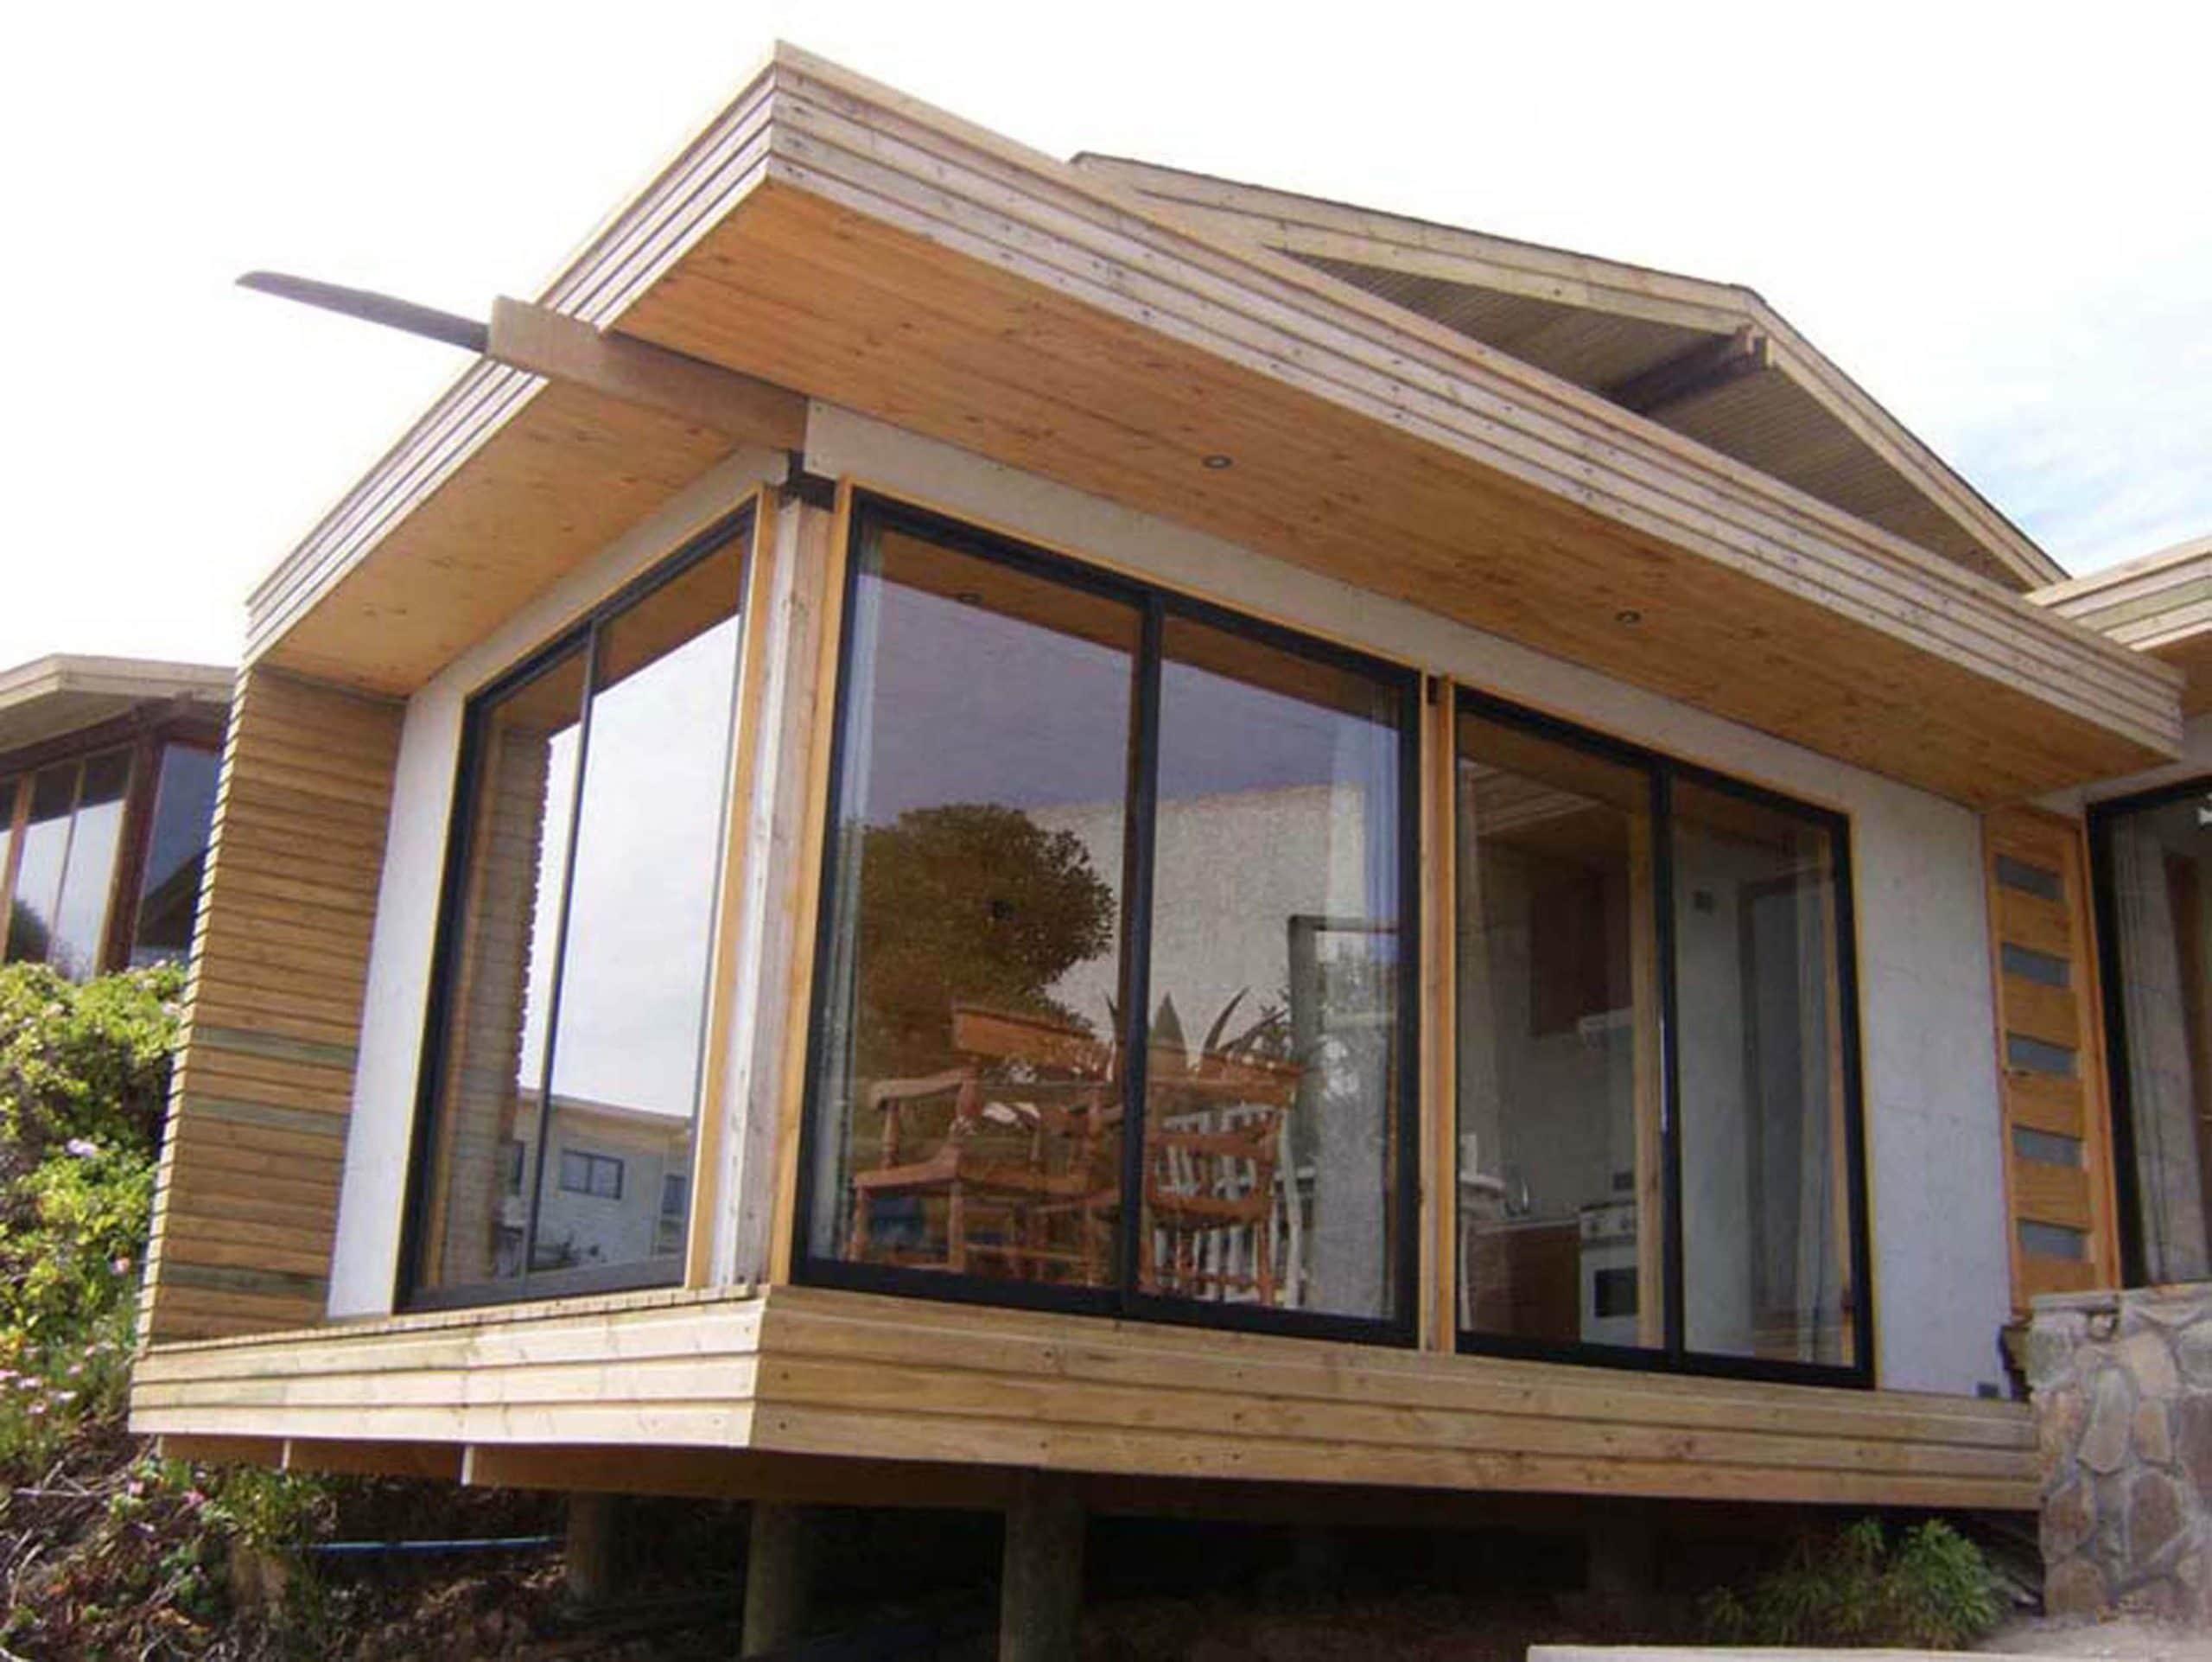 Casas prefabricadas en chile casas prefabricadas - Casa ecologicas prefabricadas ...